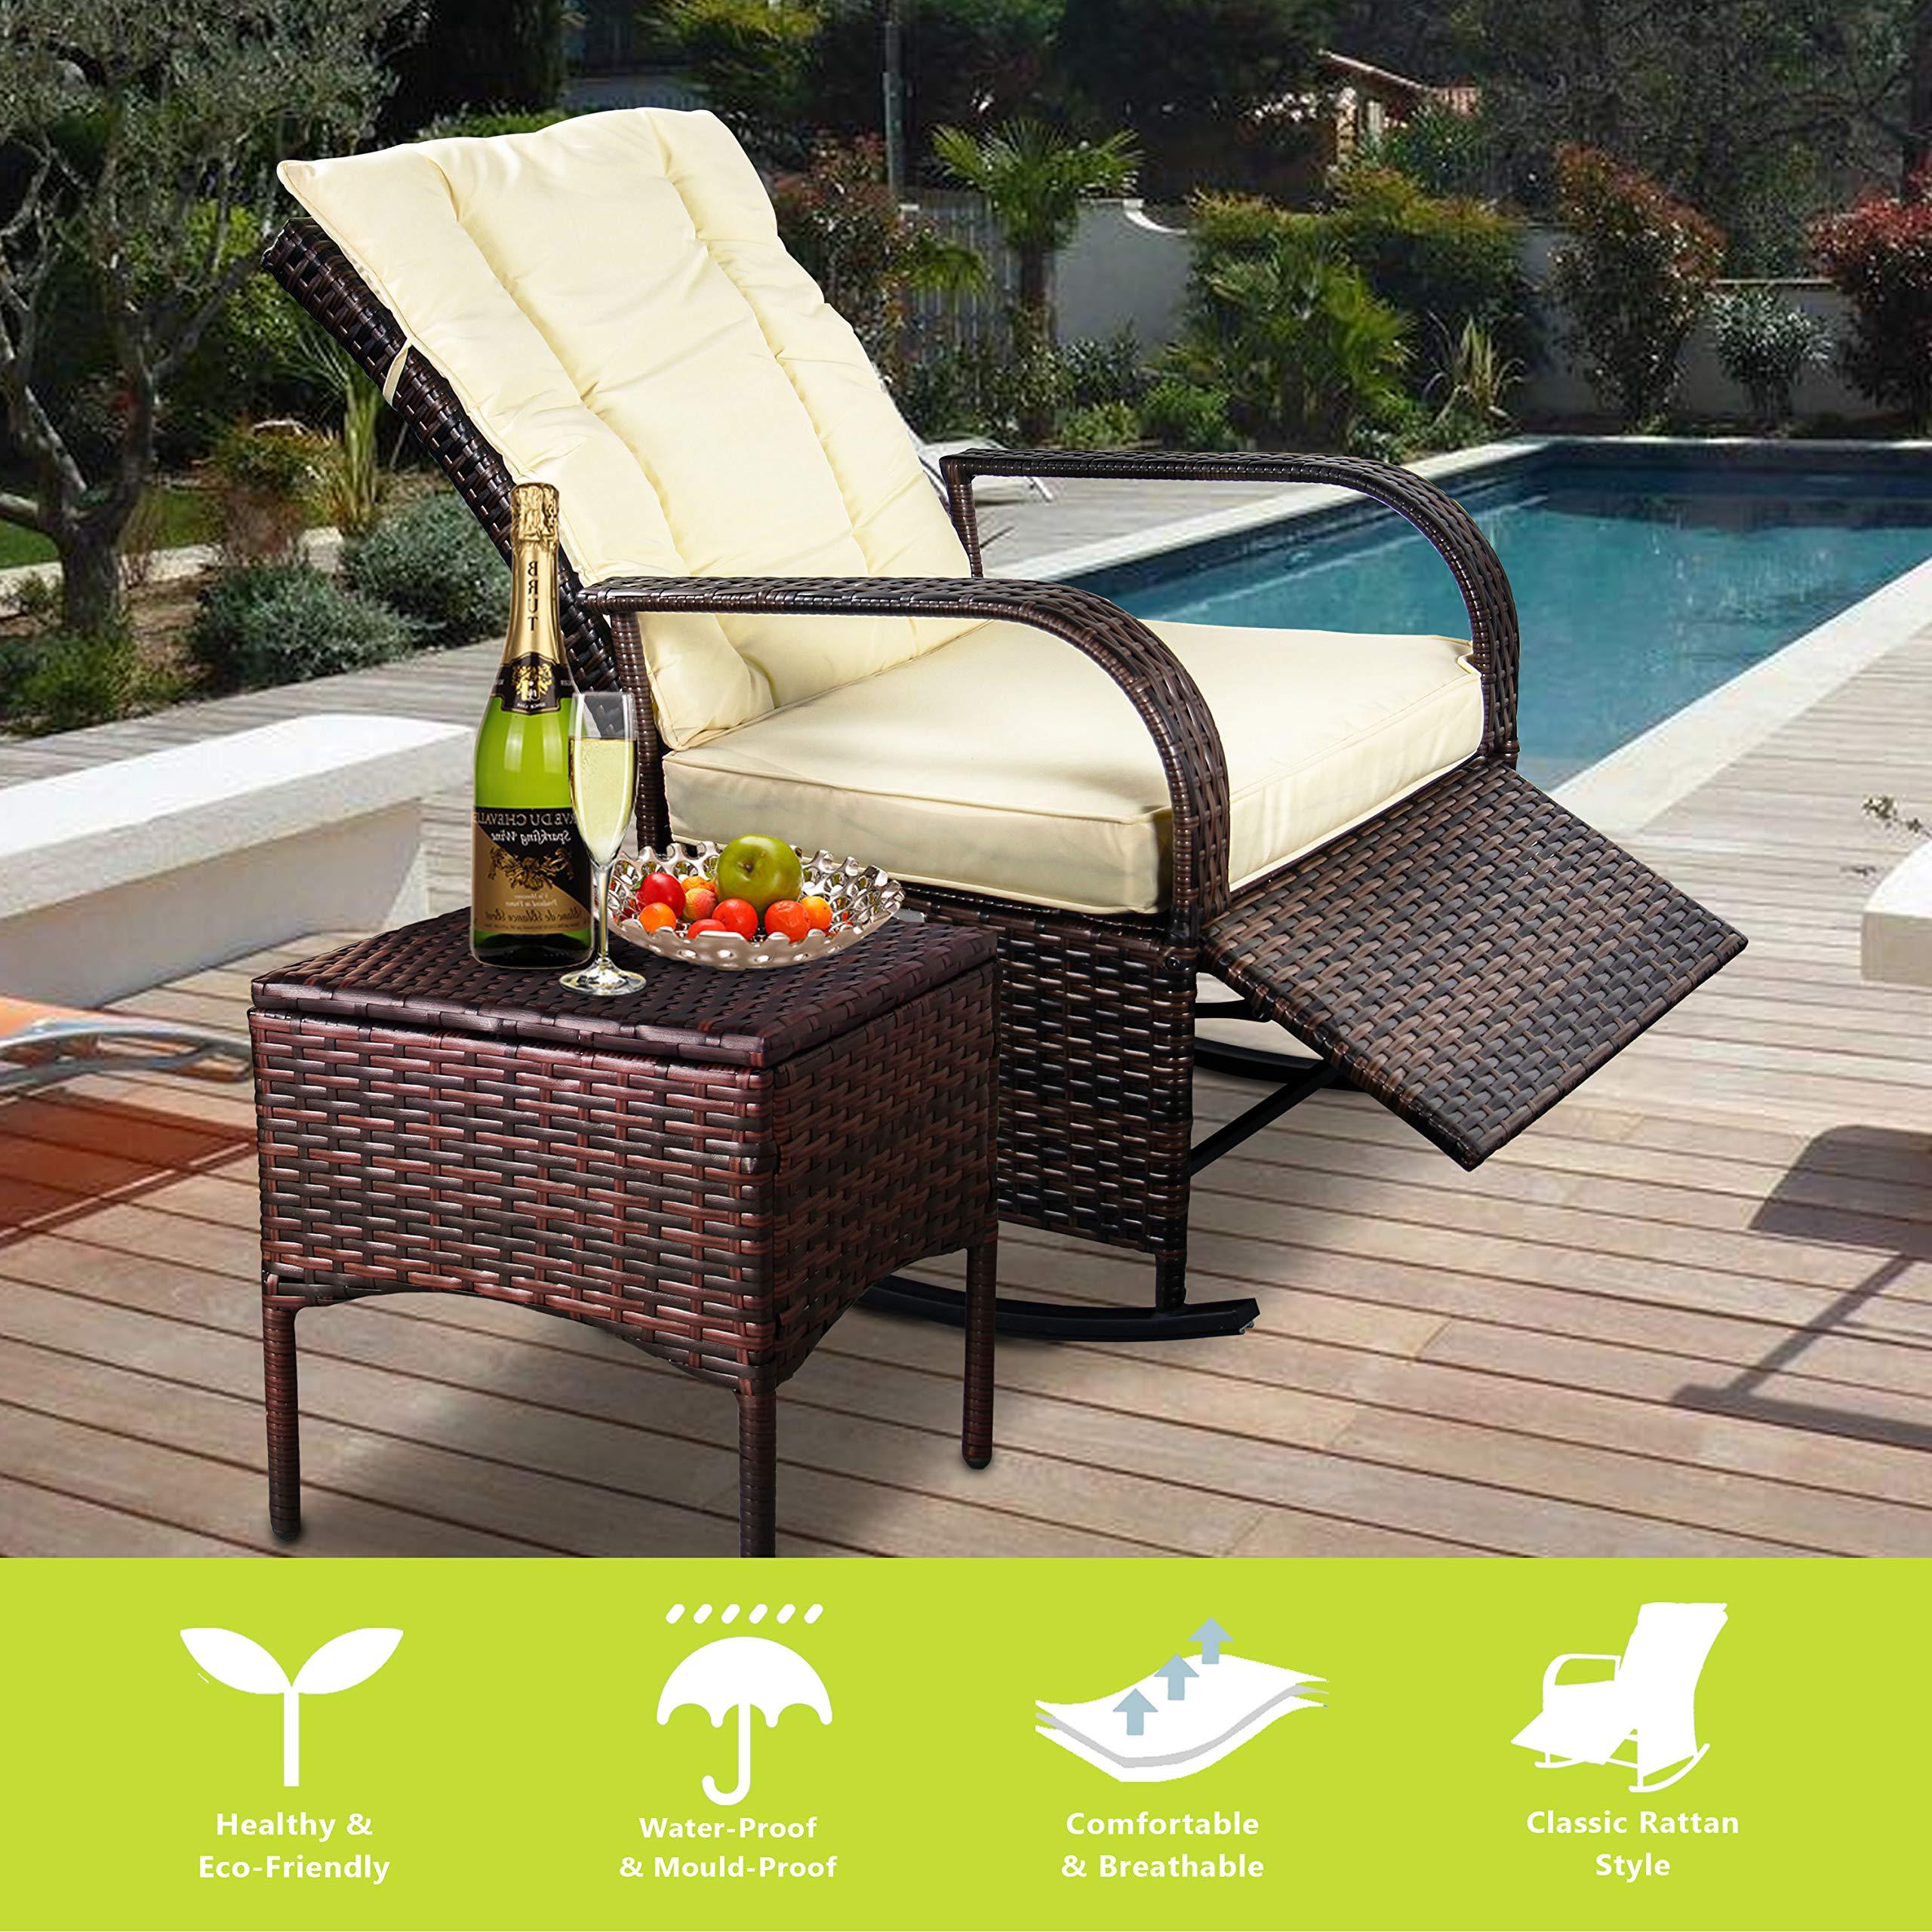 ENSTVER Indoor & Outdoor Reclining Chair-Porch Garden Lawn Deck Wicker Rocke Chair-Auto Adjustable Rattan Sofa w/Cushion (Beige-White Cushion) by ENSTVER